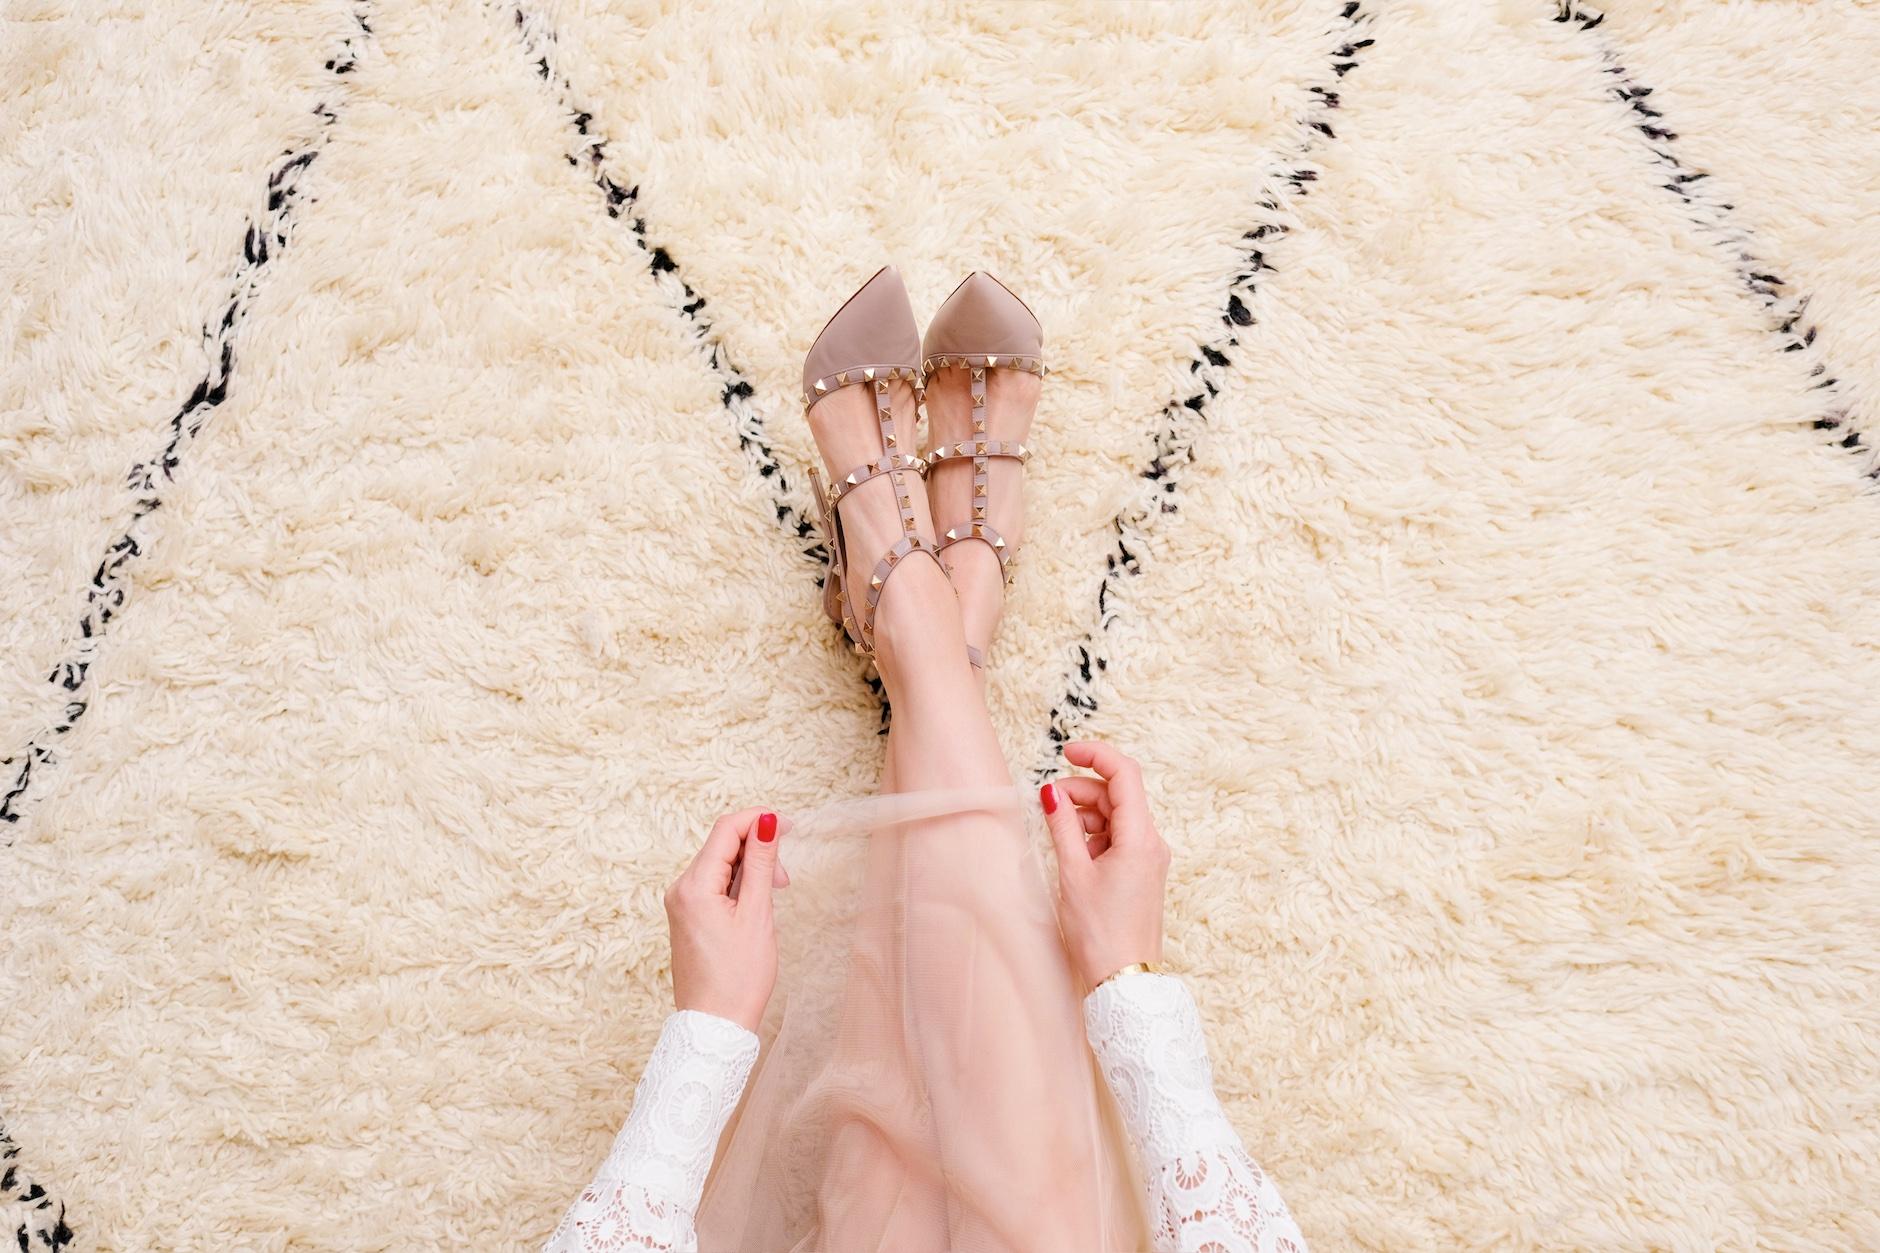 ballerina-look-edited-label-1